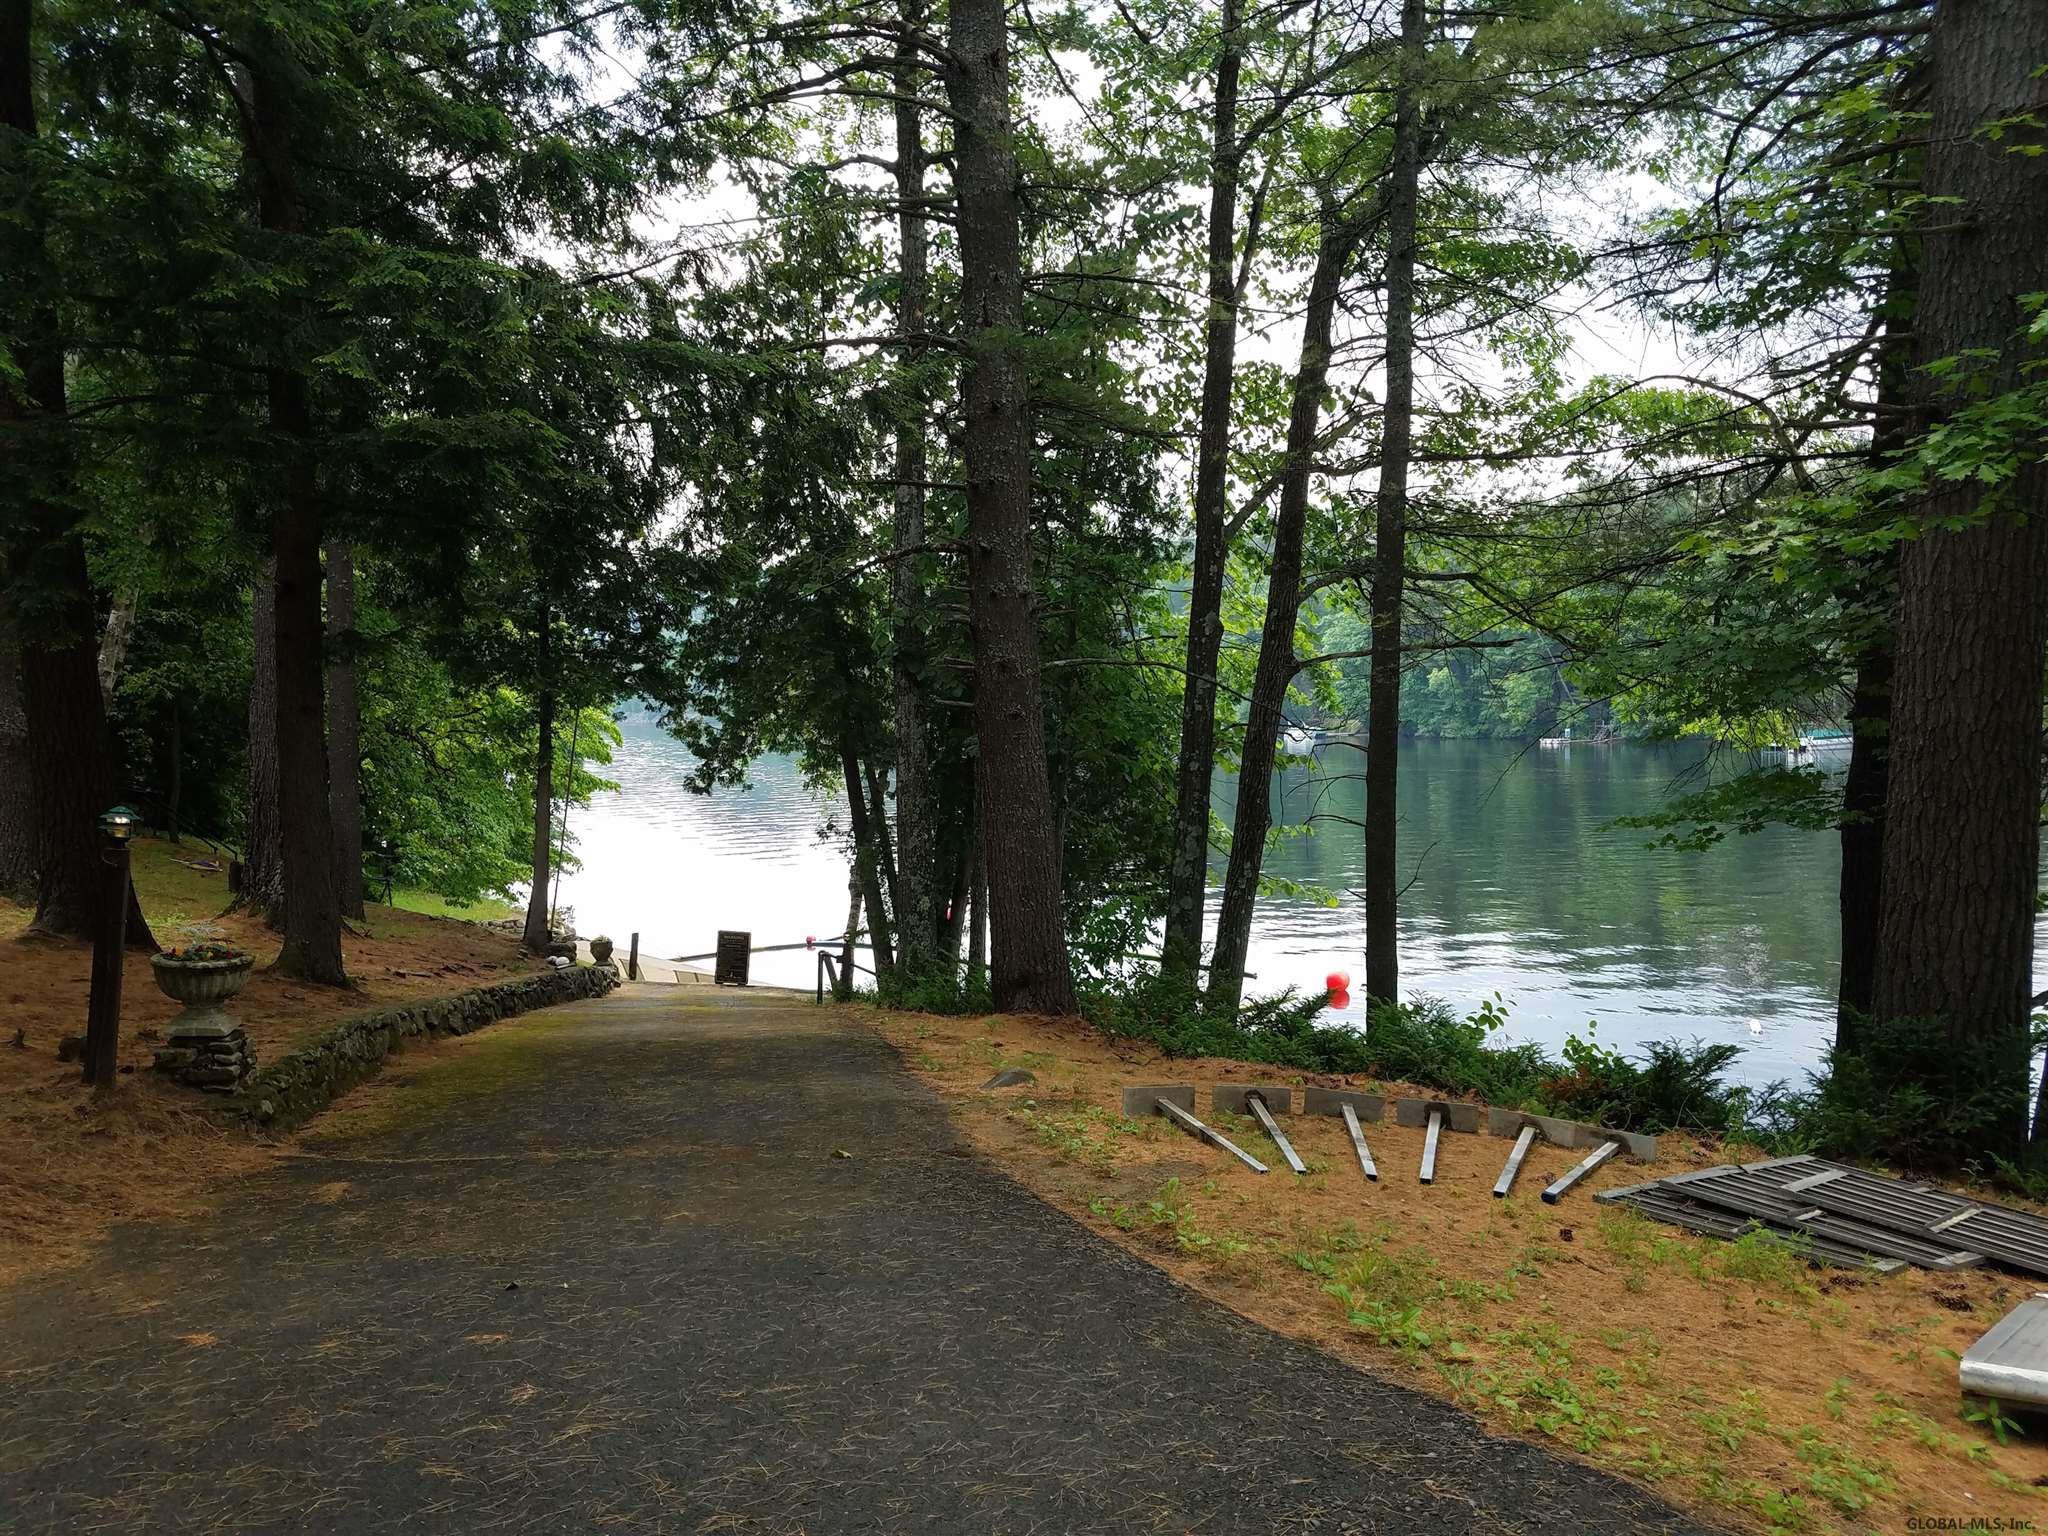 Lake Luzerne image 8